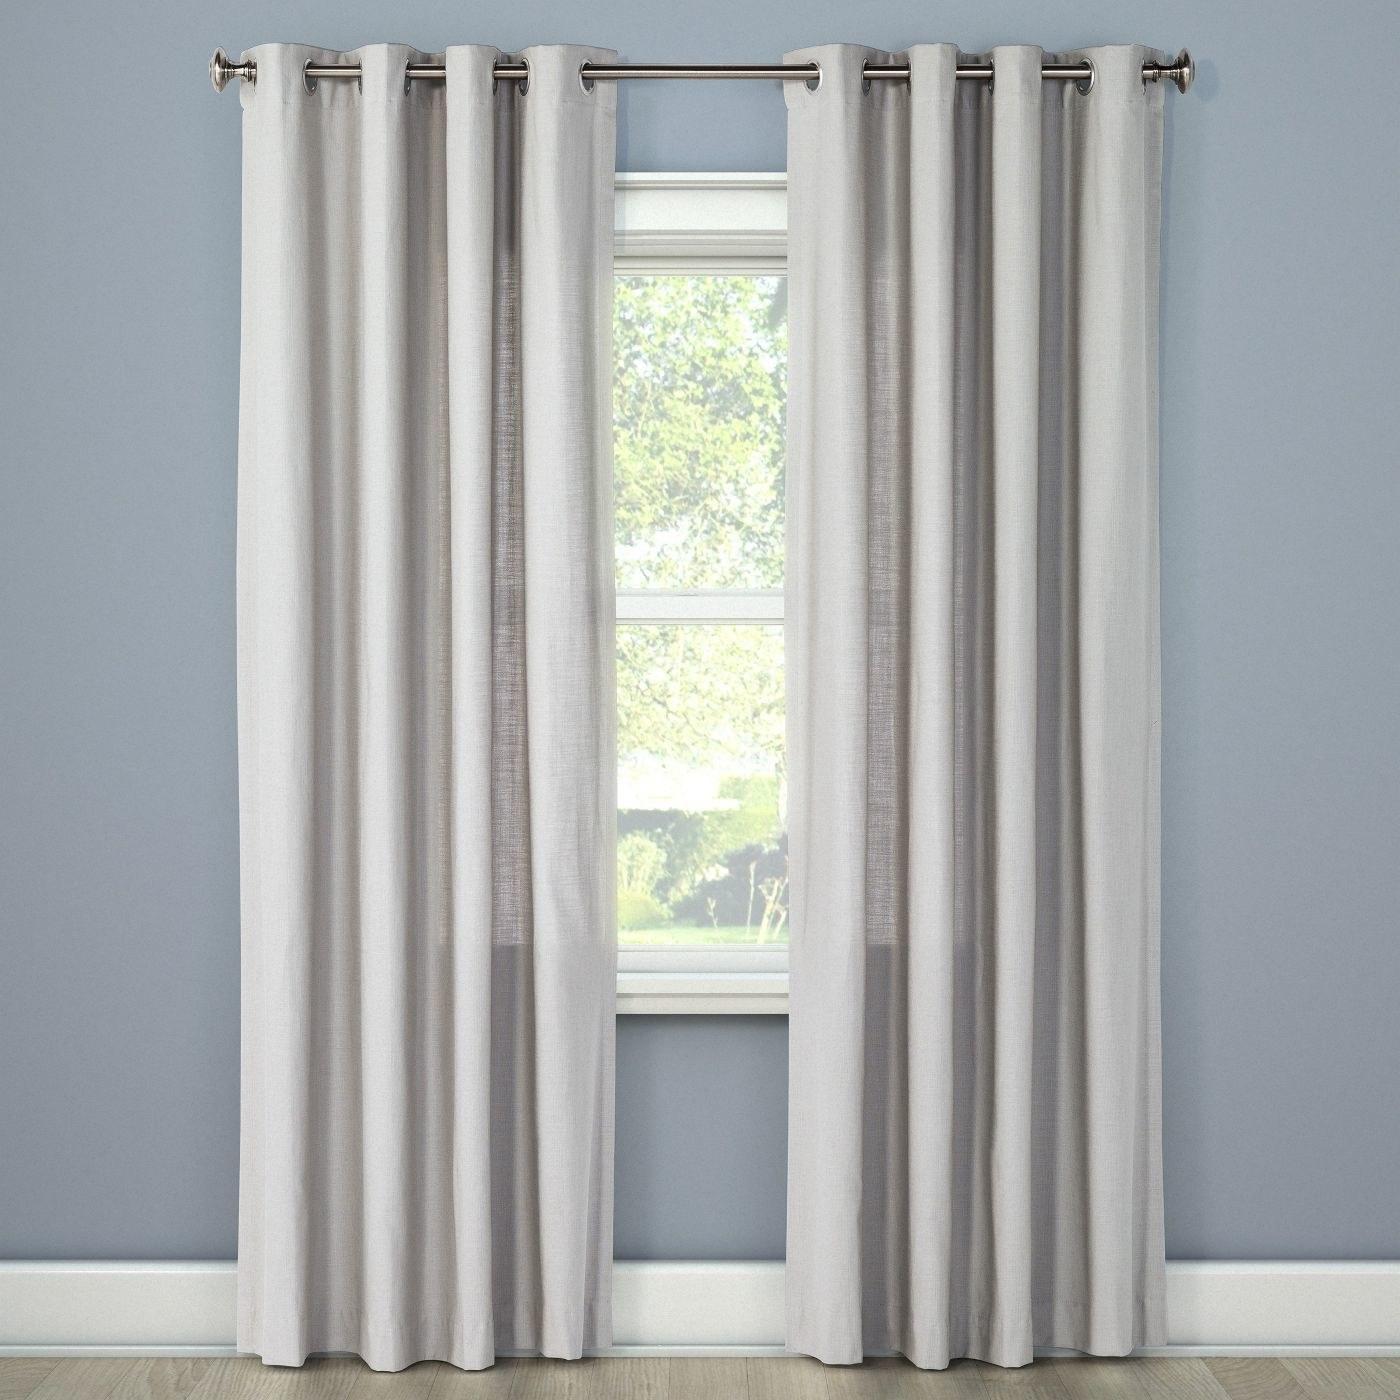 a set of light grey curtains